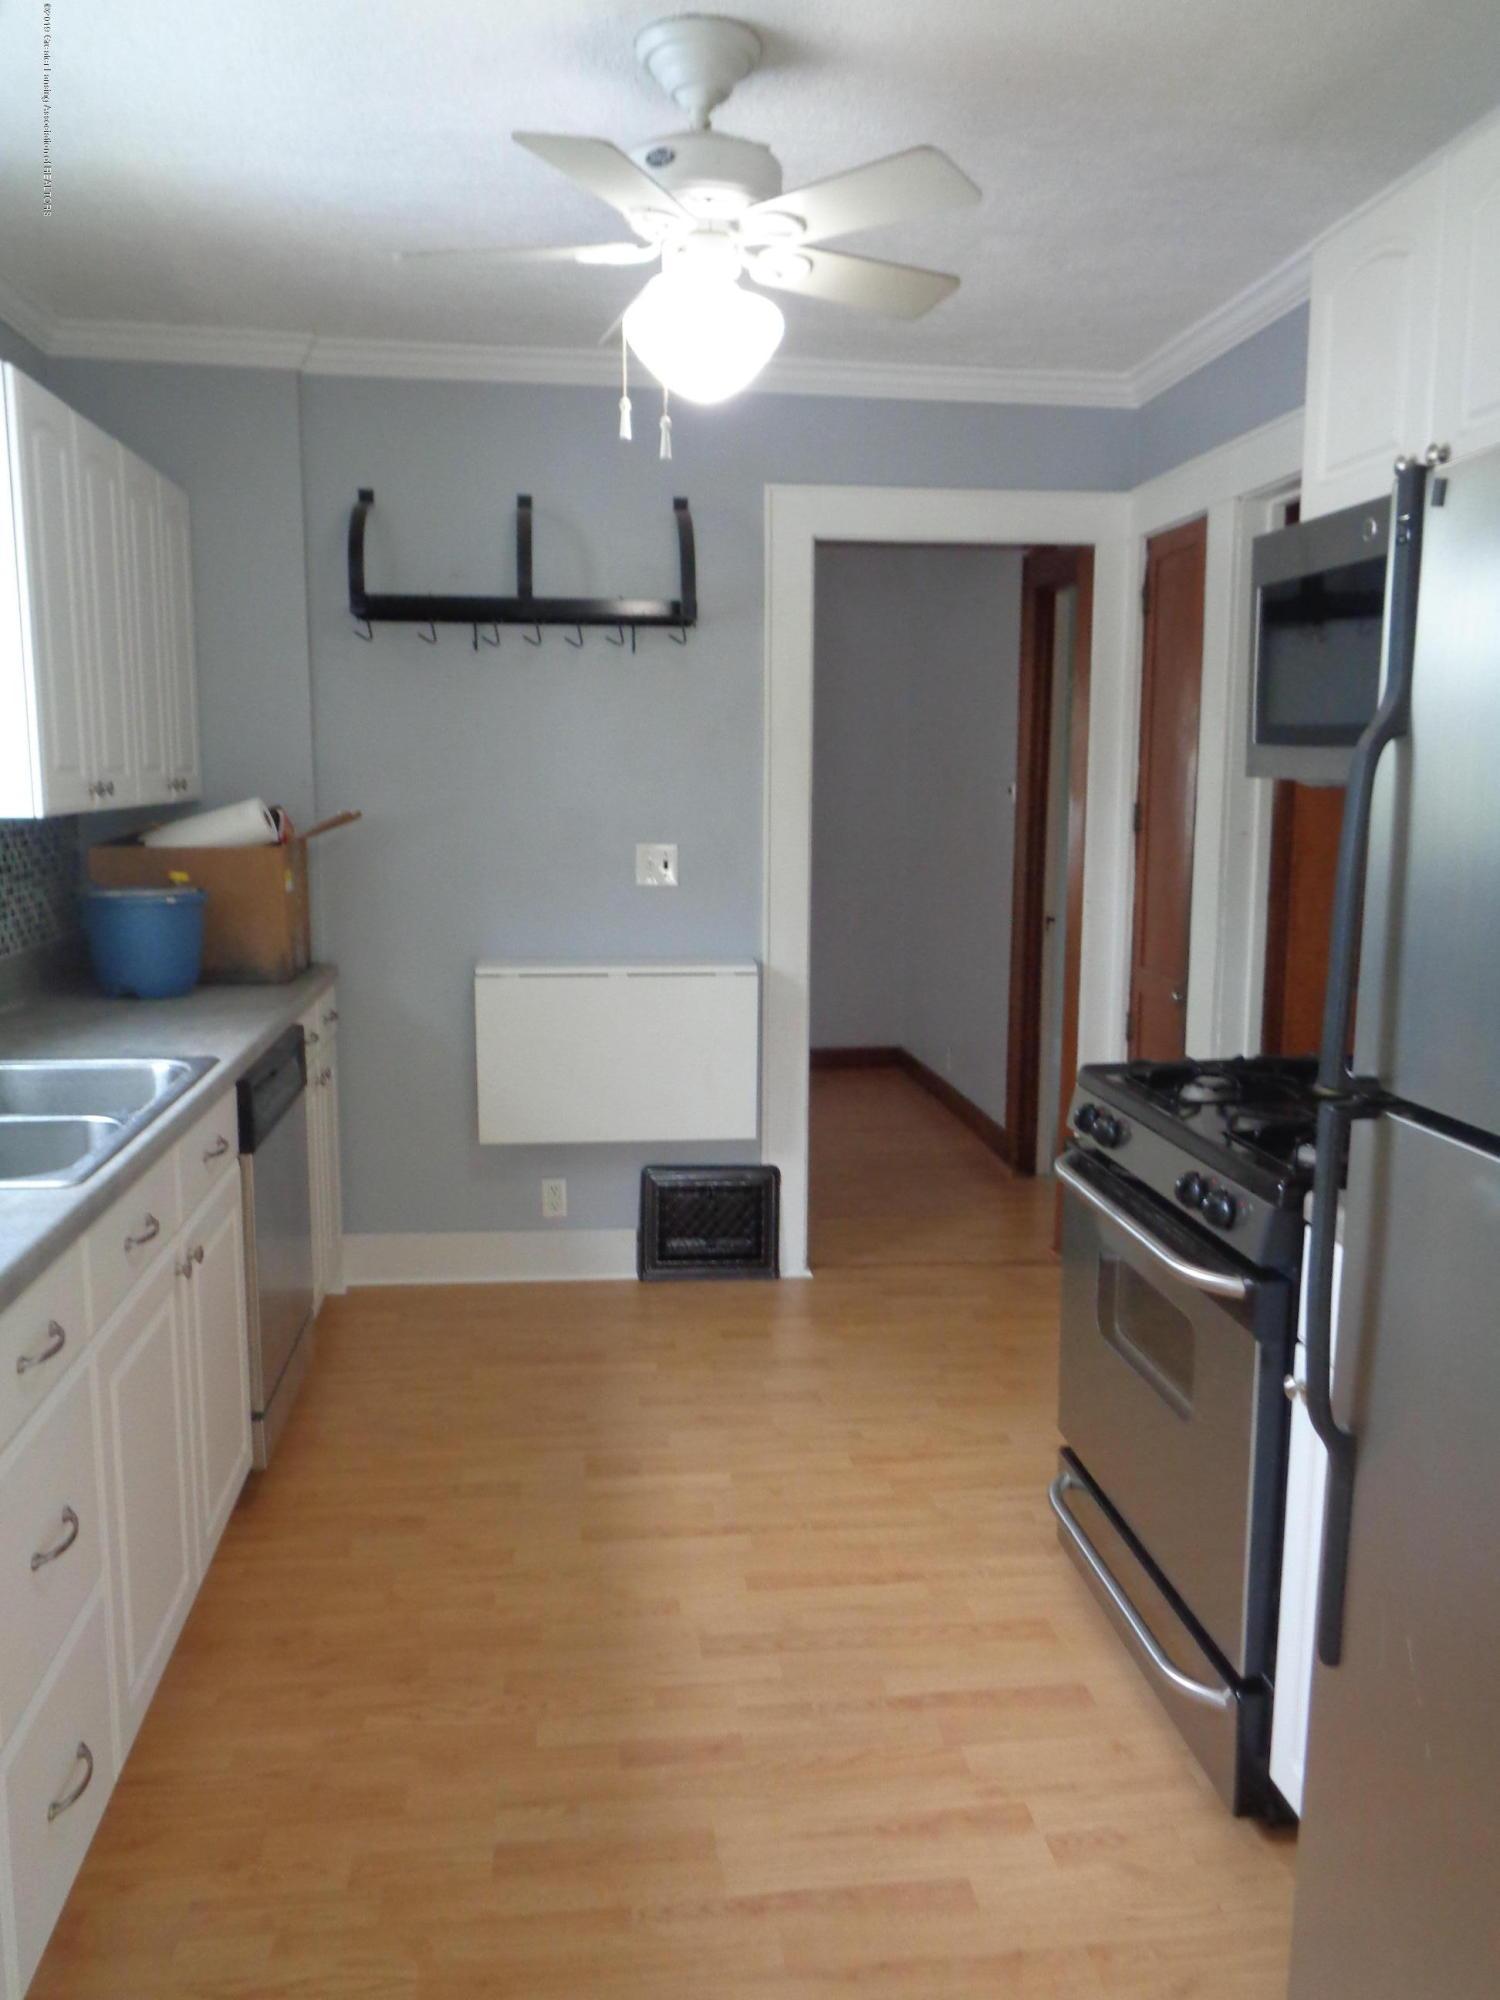 3522 N Aurelius Rd - aurelius kitchen 2 - 2